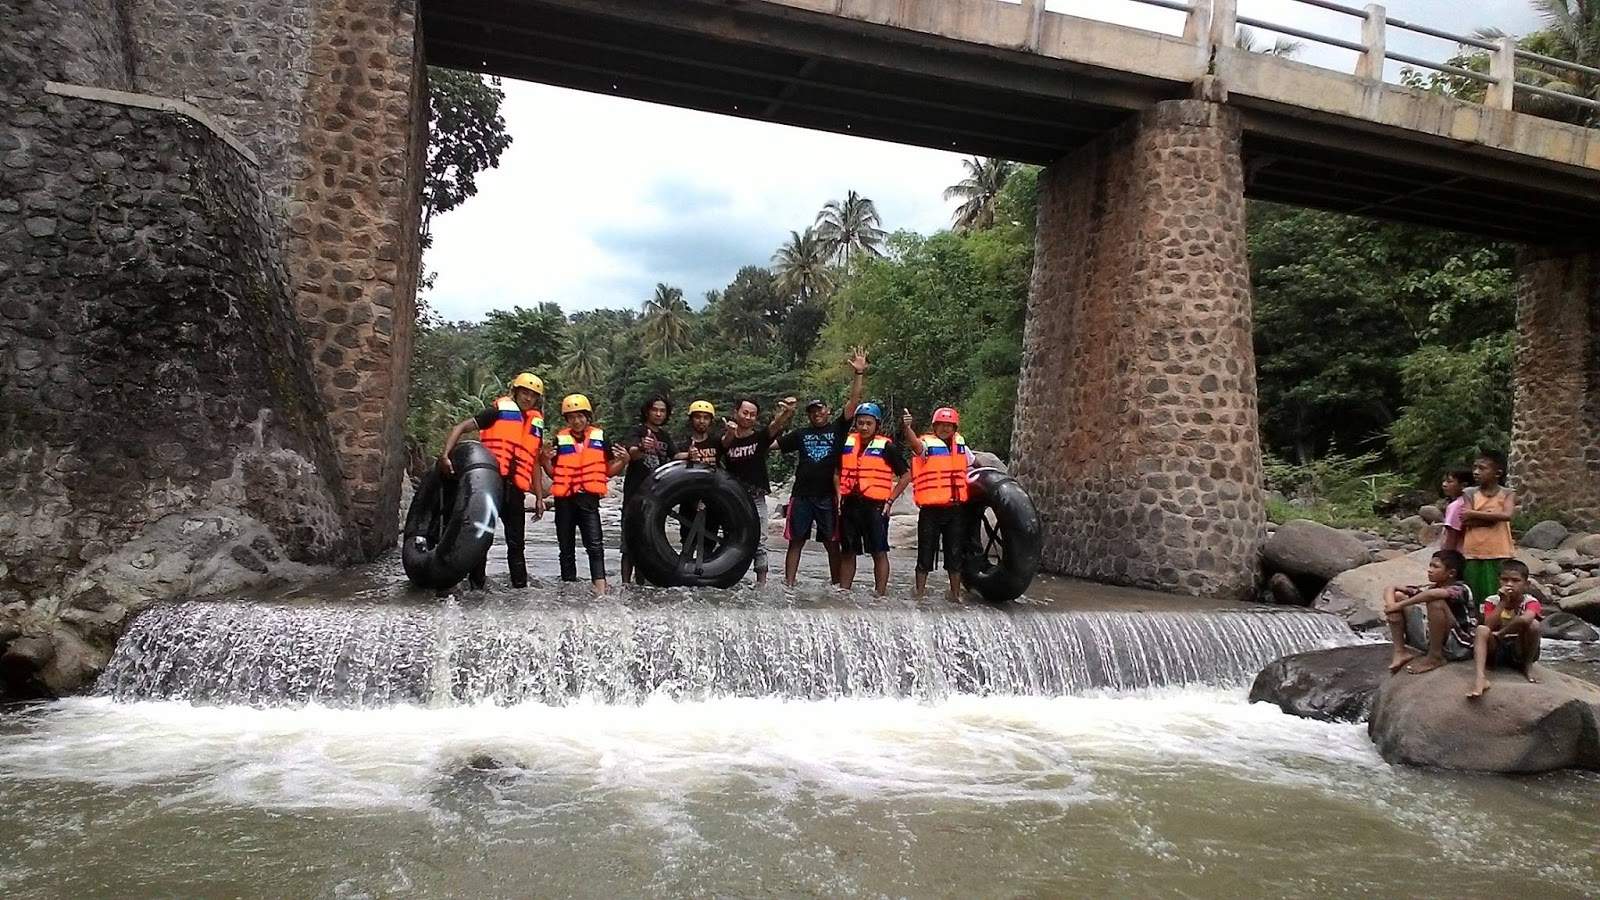 Wahana Wisata River Tubing Pertama Kabupaten Nganjuk Ekseklusif Taman Kota